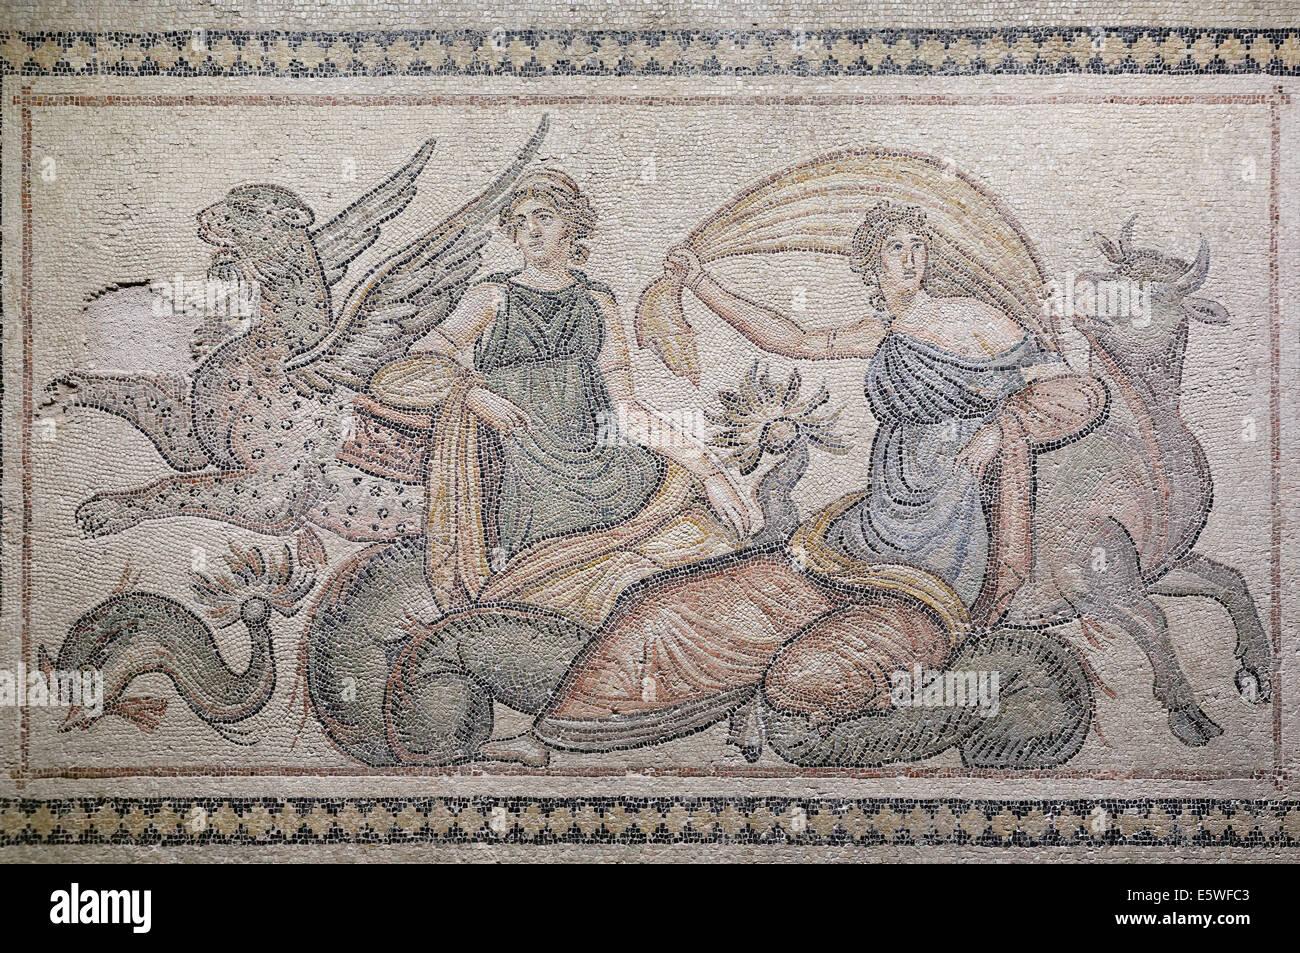 Abduction of Europa, mosaic from Zeugma, Zeugma Mosaic Museum, Gaziantep, Southeastern Anatolia Region, Anatolia, - Stock Image